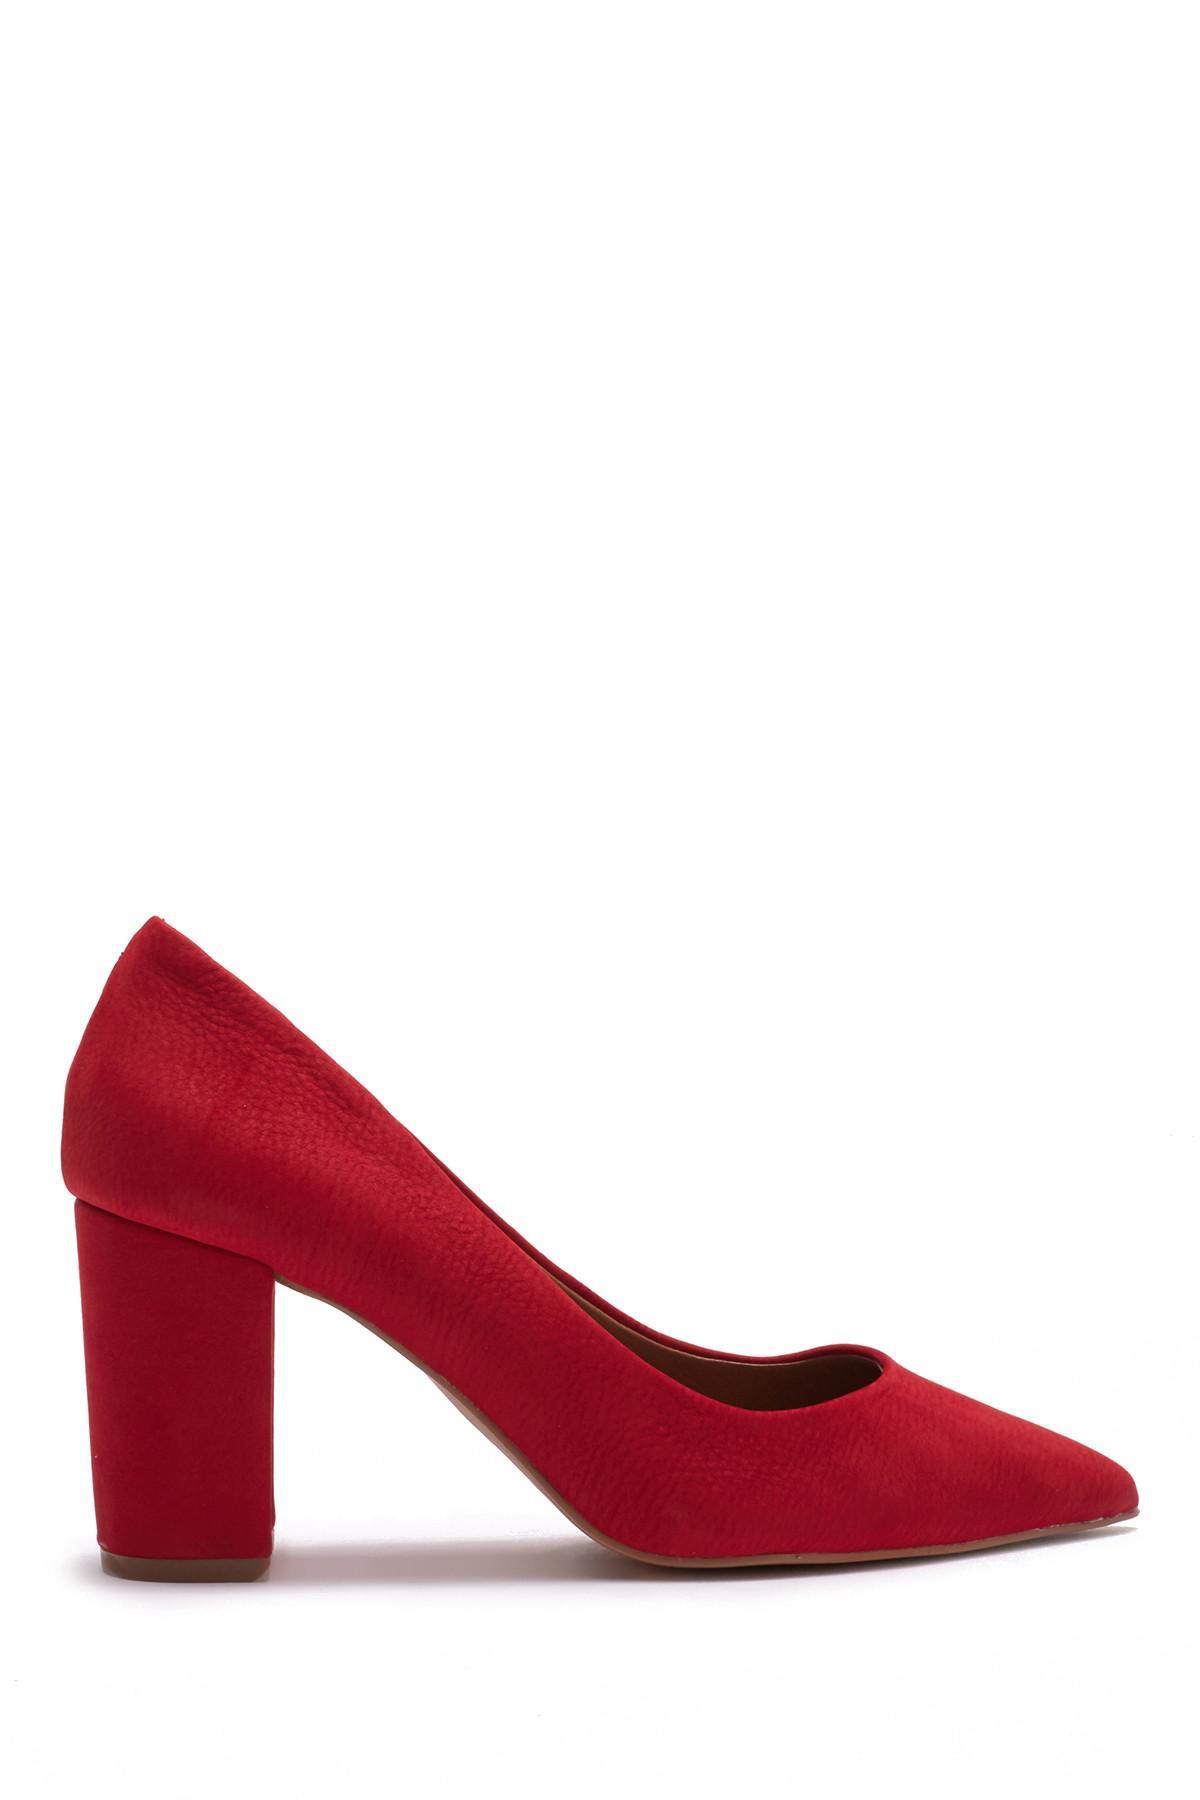 1fe5f0aad6c Lyst - Steve Madden Ashlyn Nubuck Leather Block Heel Pump in Red